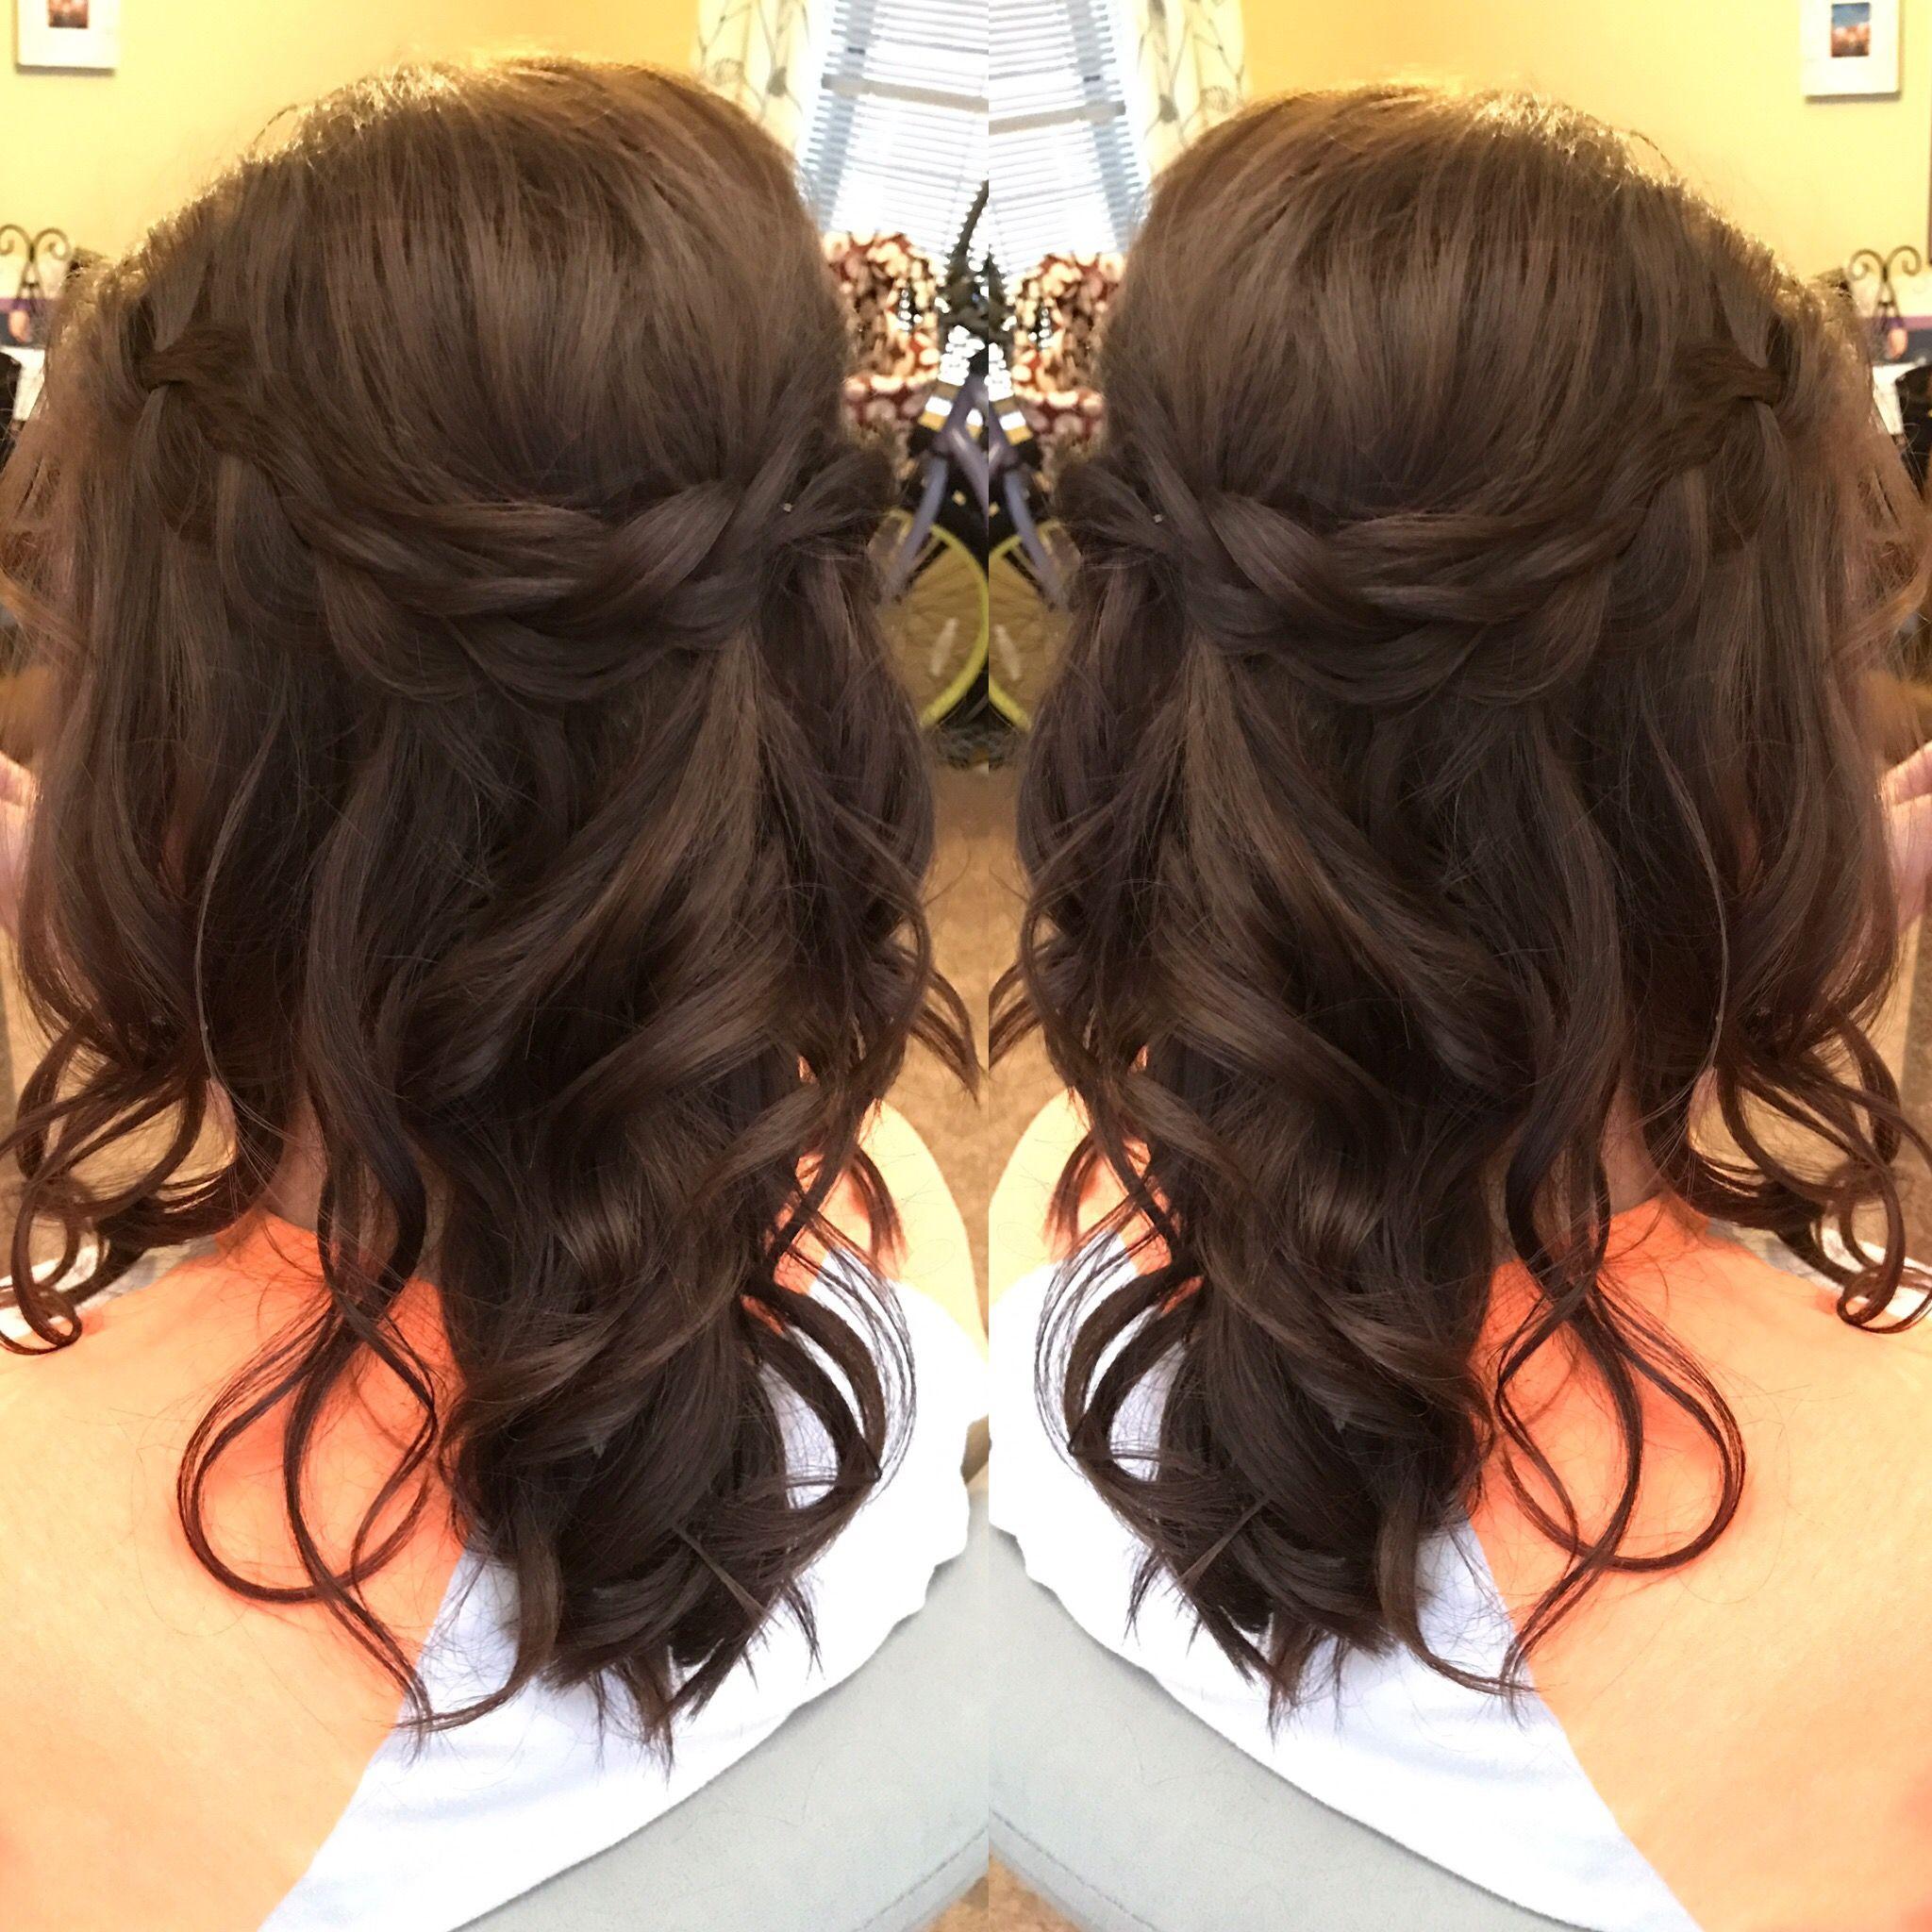 Loose curls updo half up half down hairstyle brunette